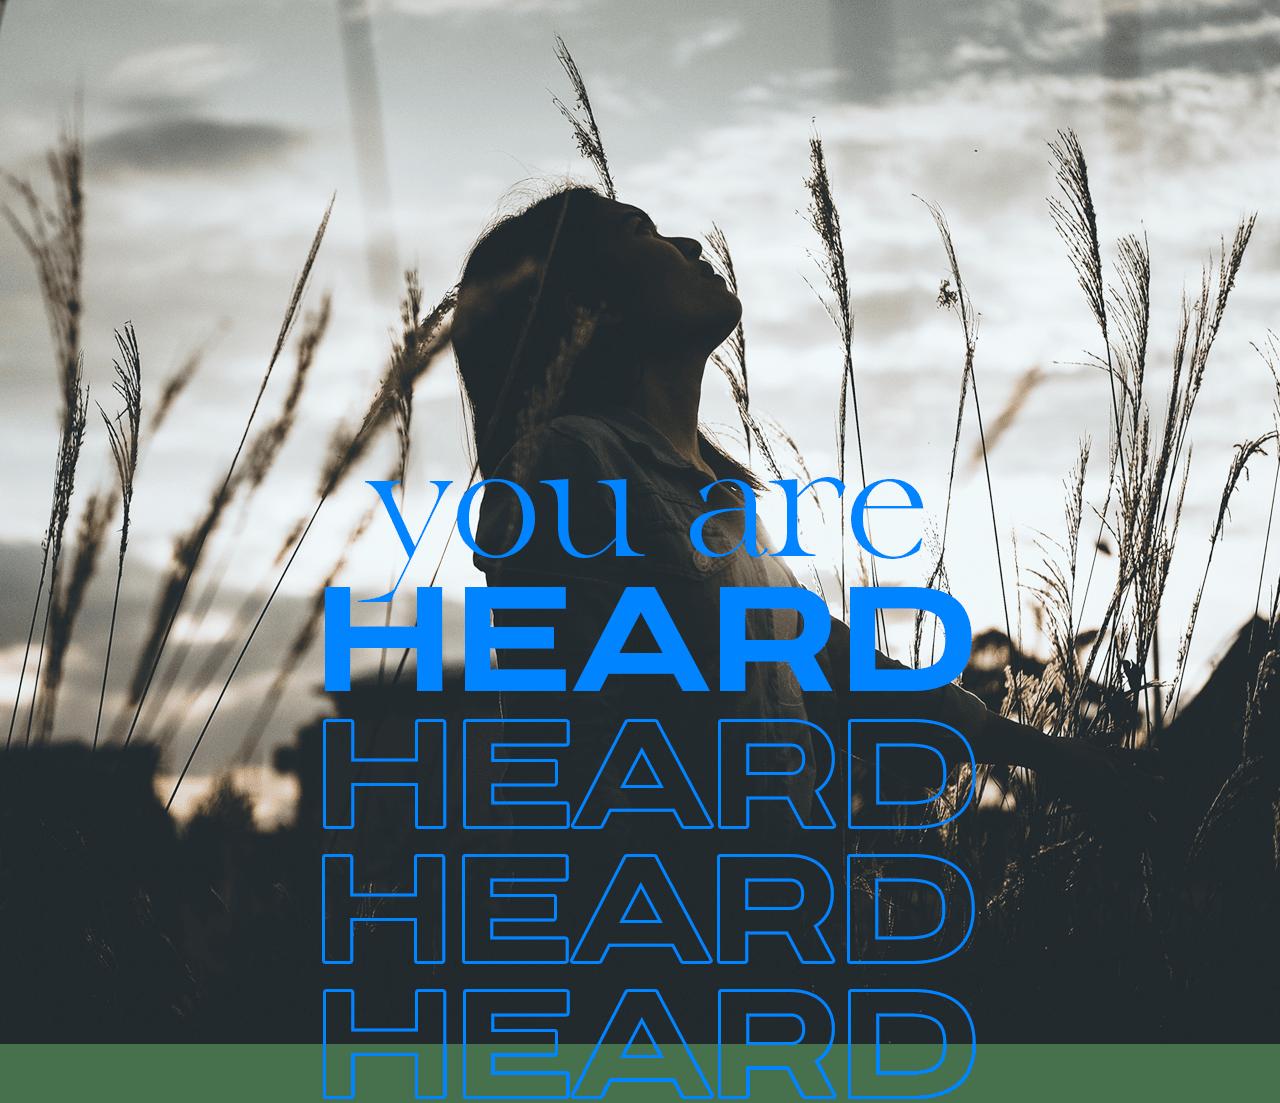 You are heard